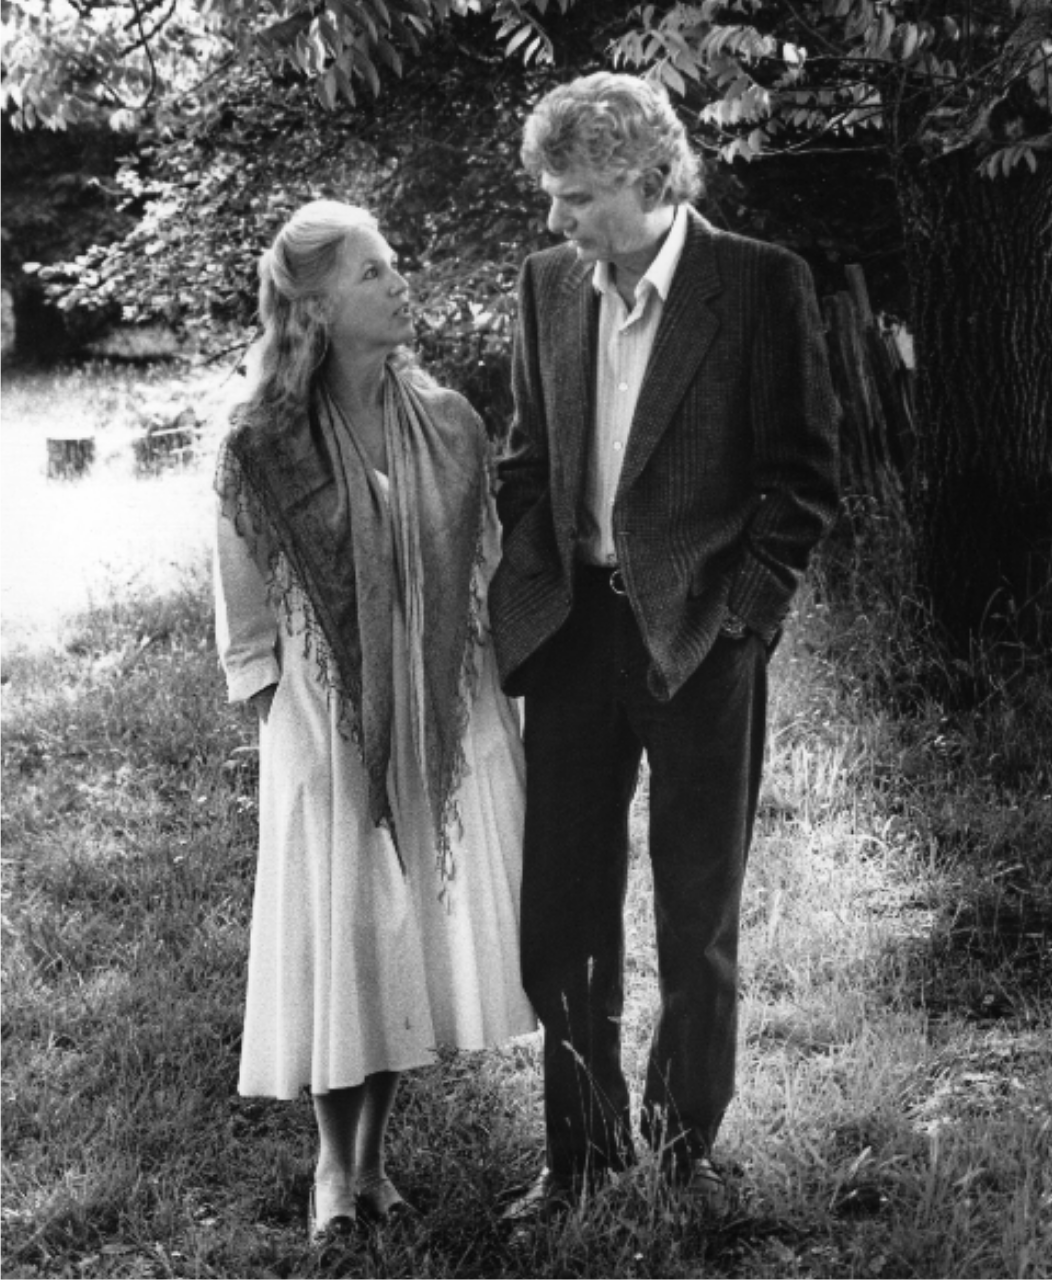 Hal & Sidra - 1983